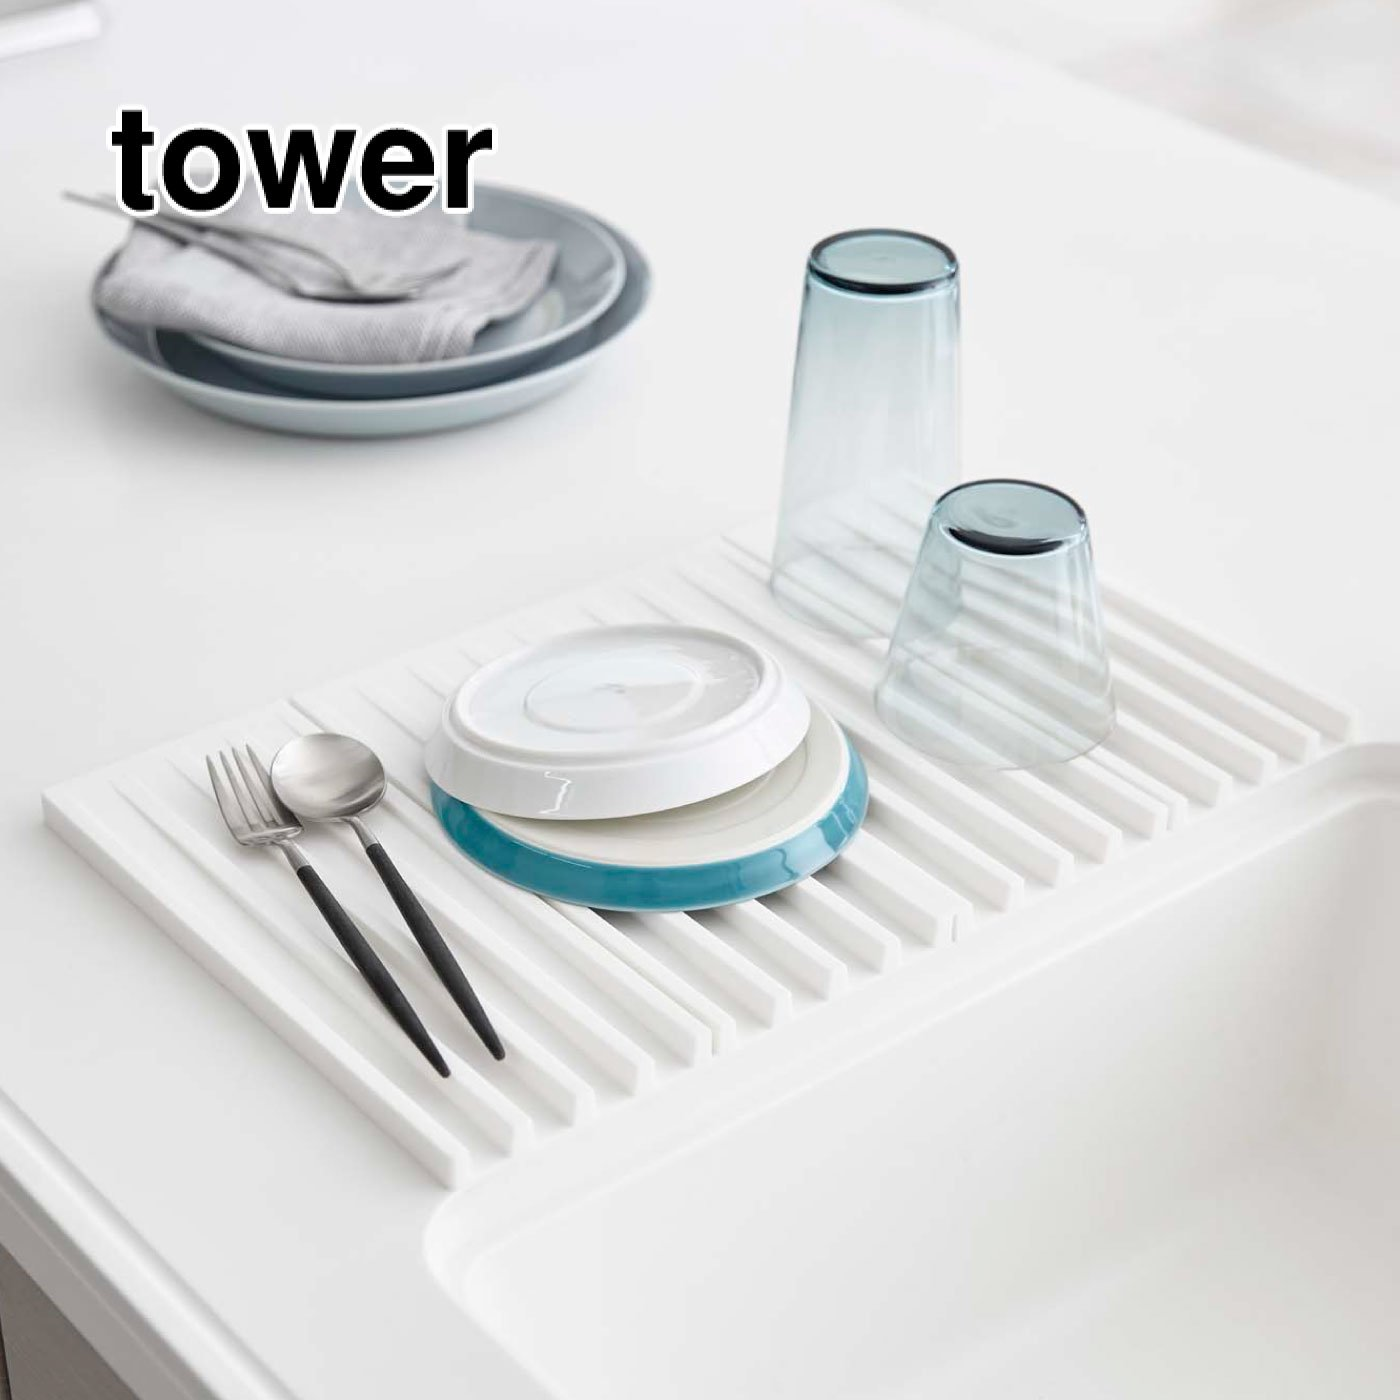 tower 折り畳み水切りトレー